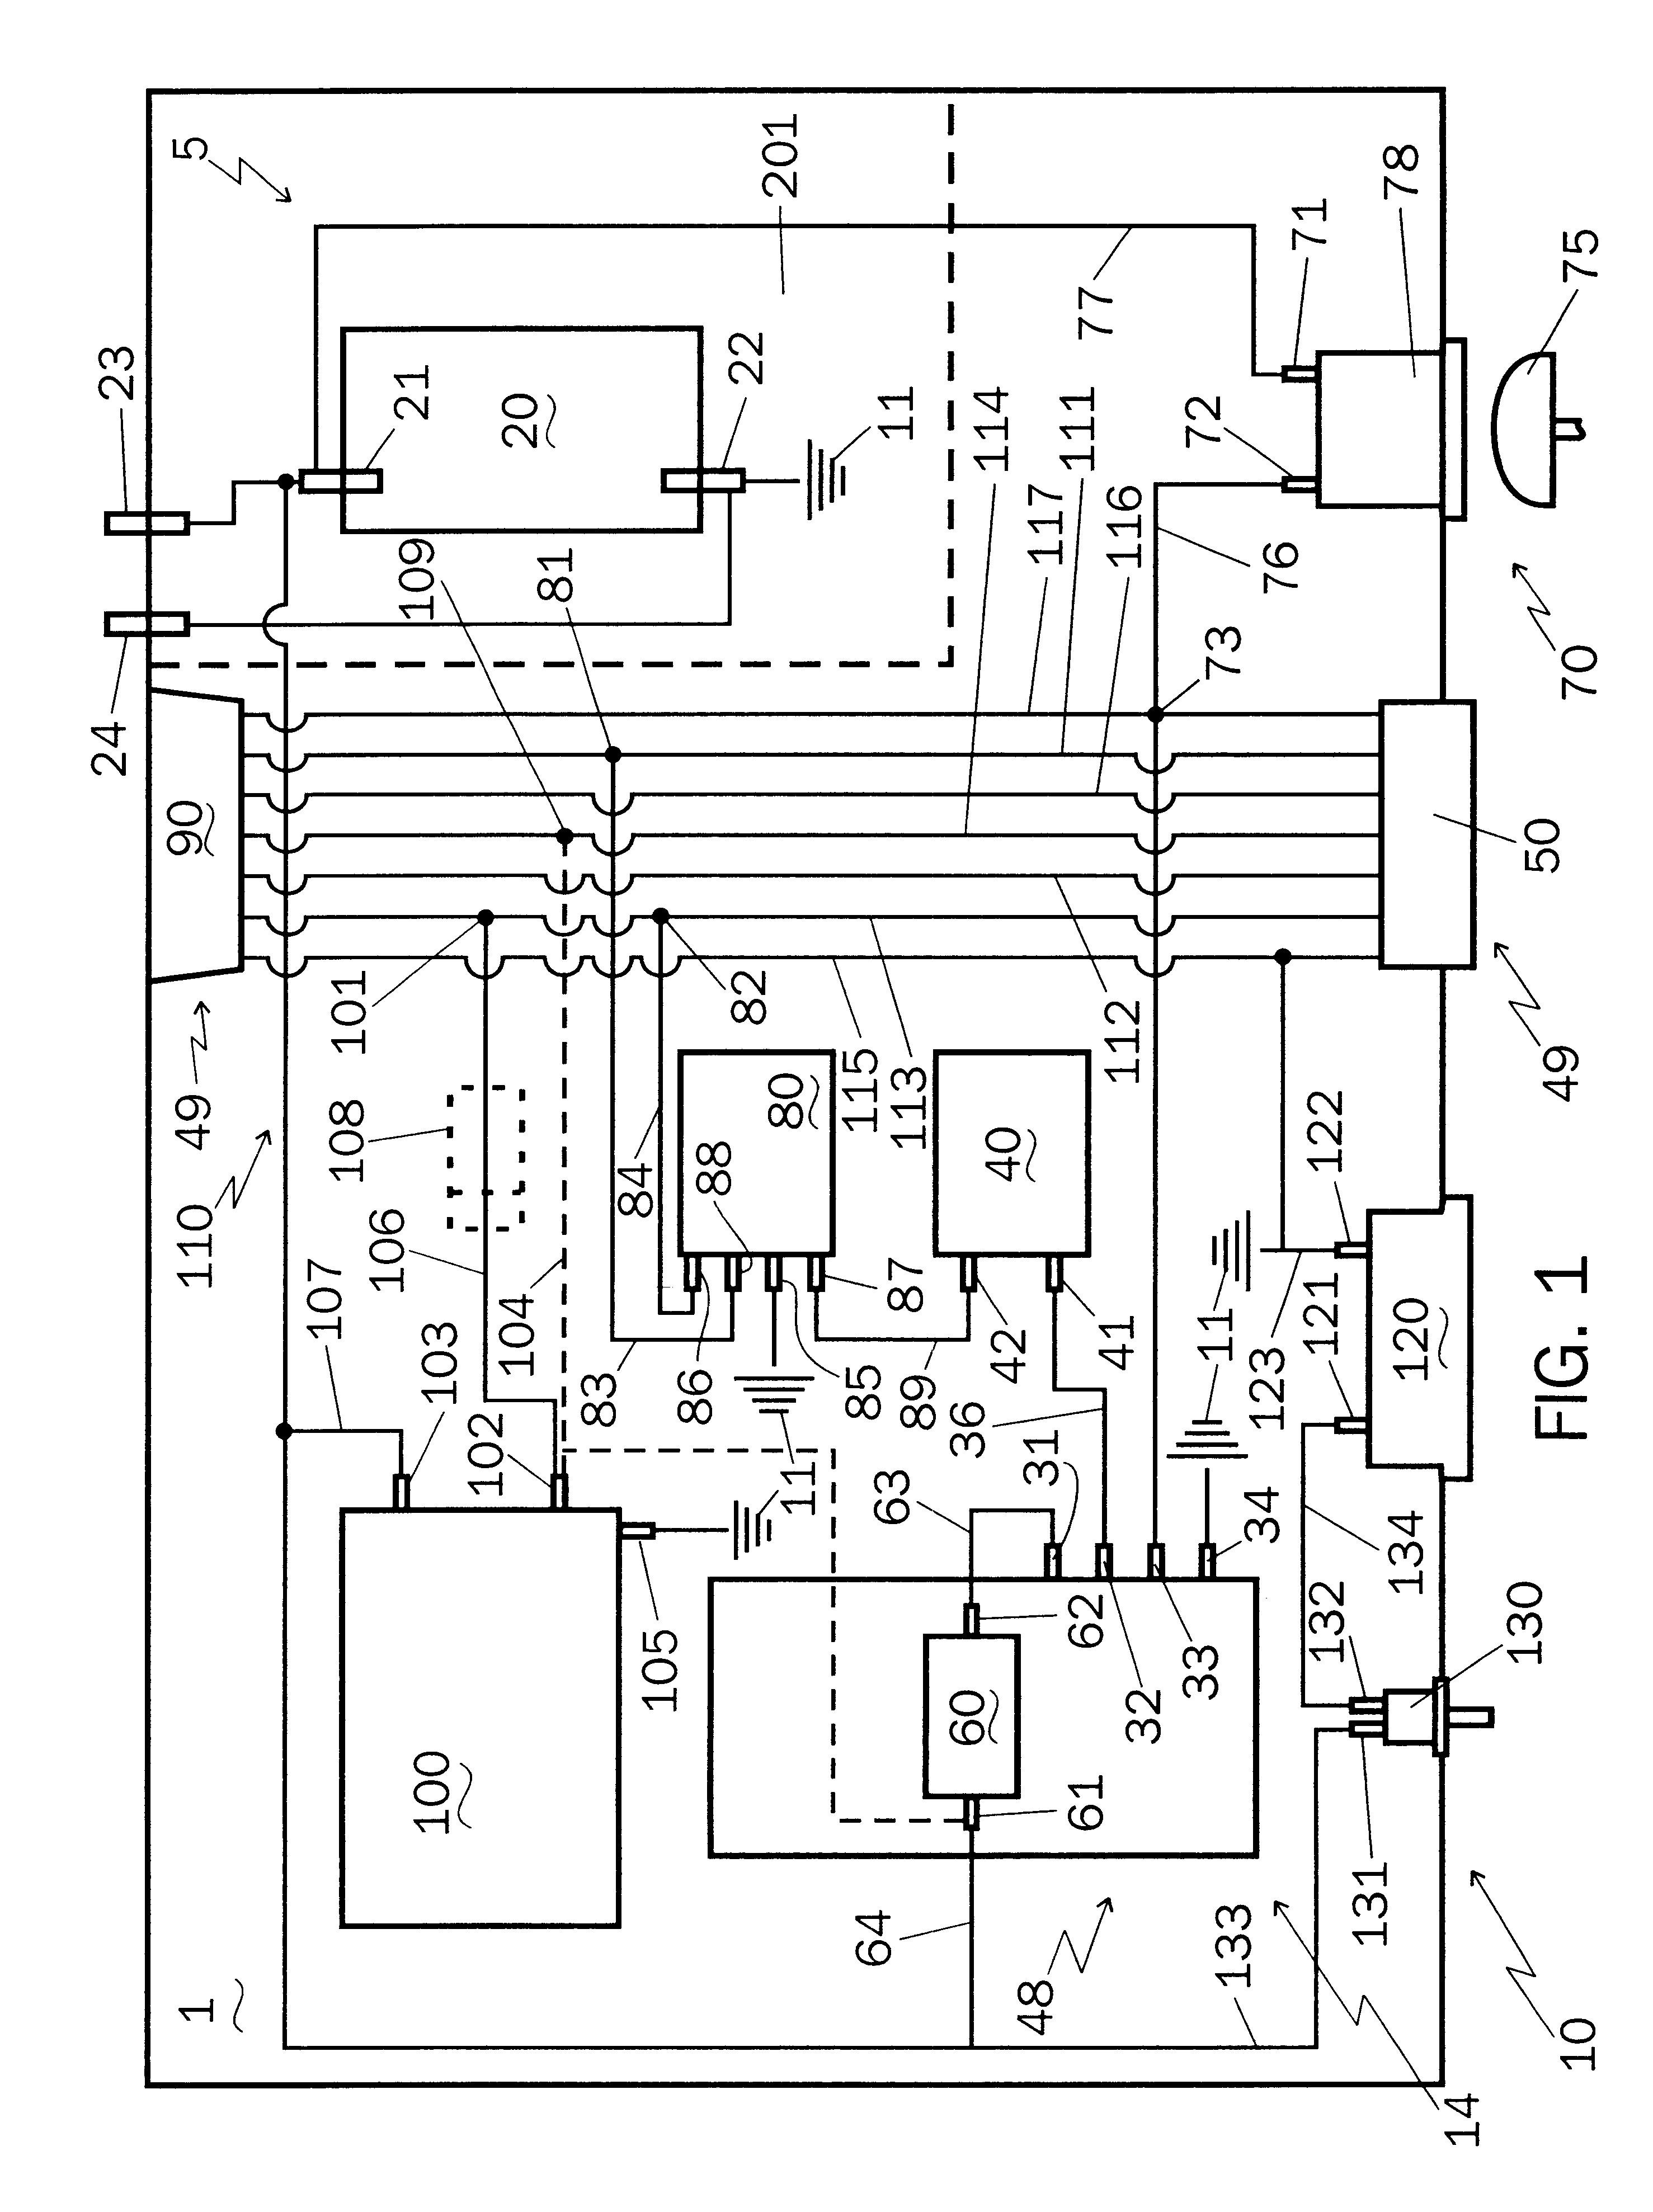 ford trailer brake controller wiring diagram Download-Wiring Diagram Trailer Electric Brakes Best Curt Trailer Brake Controller Wiring Diagram Control In Wiring 5-t